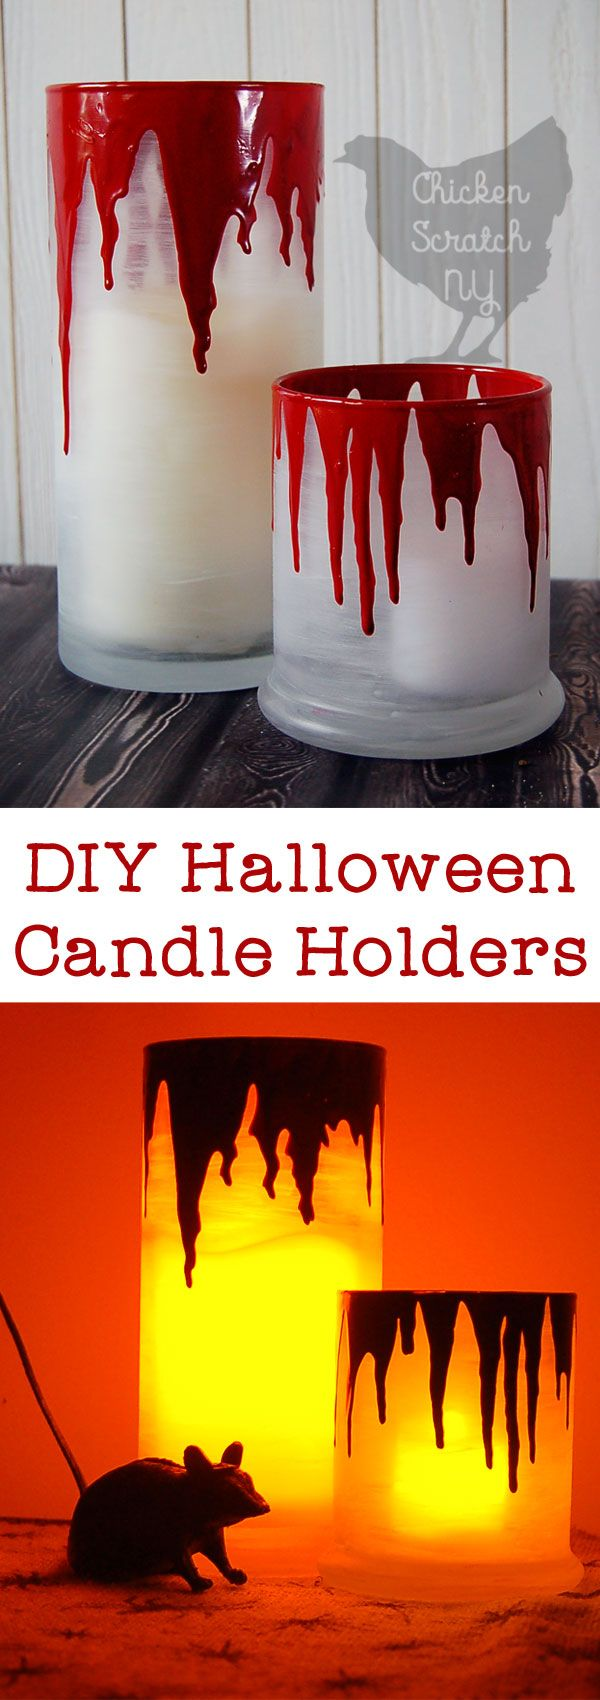 Halloween Candle Holders, Bleeding Candle Holder, Halloween DIY, Halloween Decoration